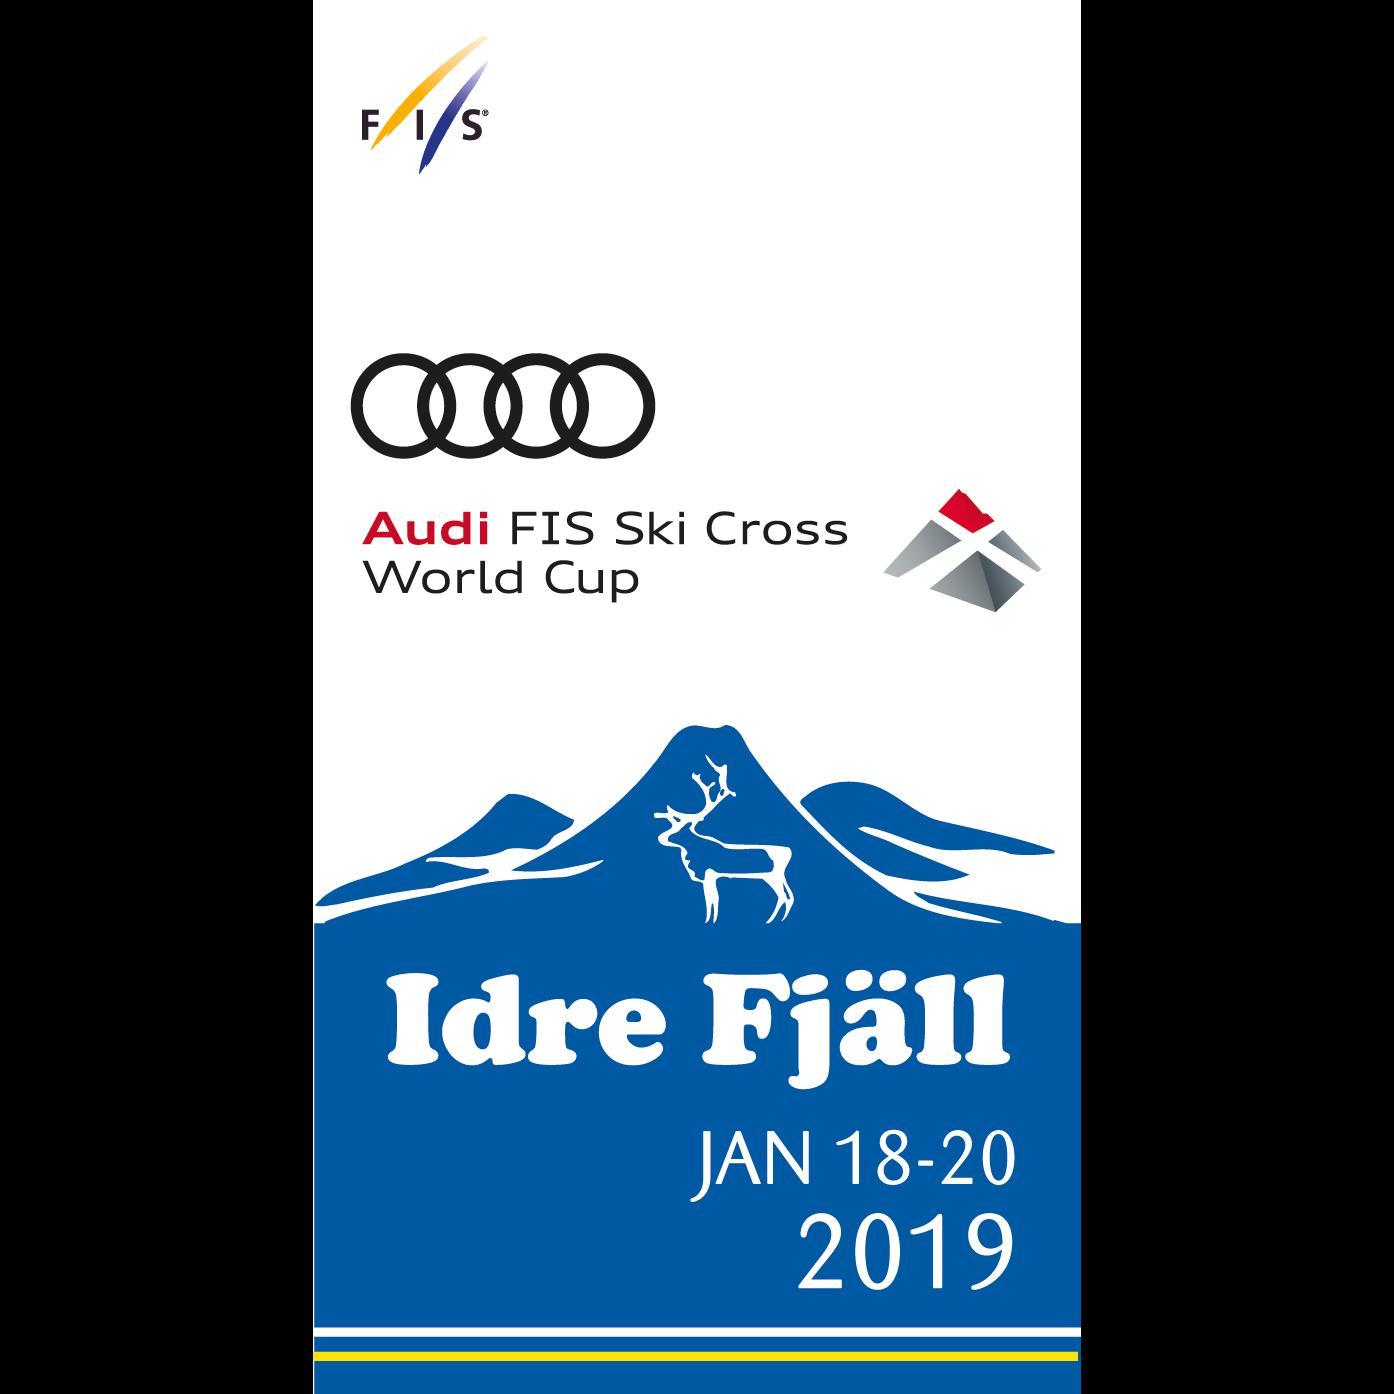 2019 FIS Freestyle Skiing World Cup - Ski Cross